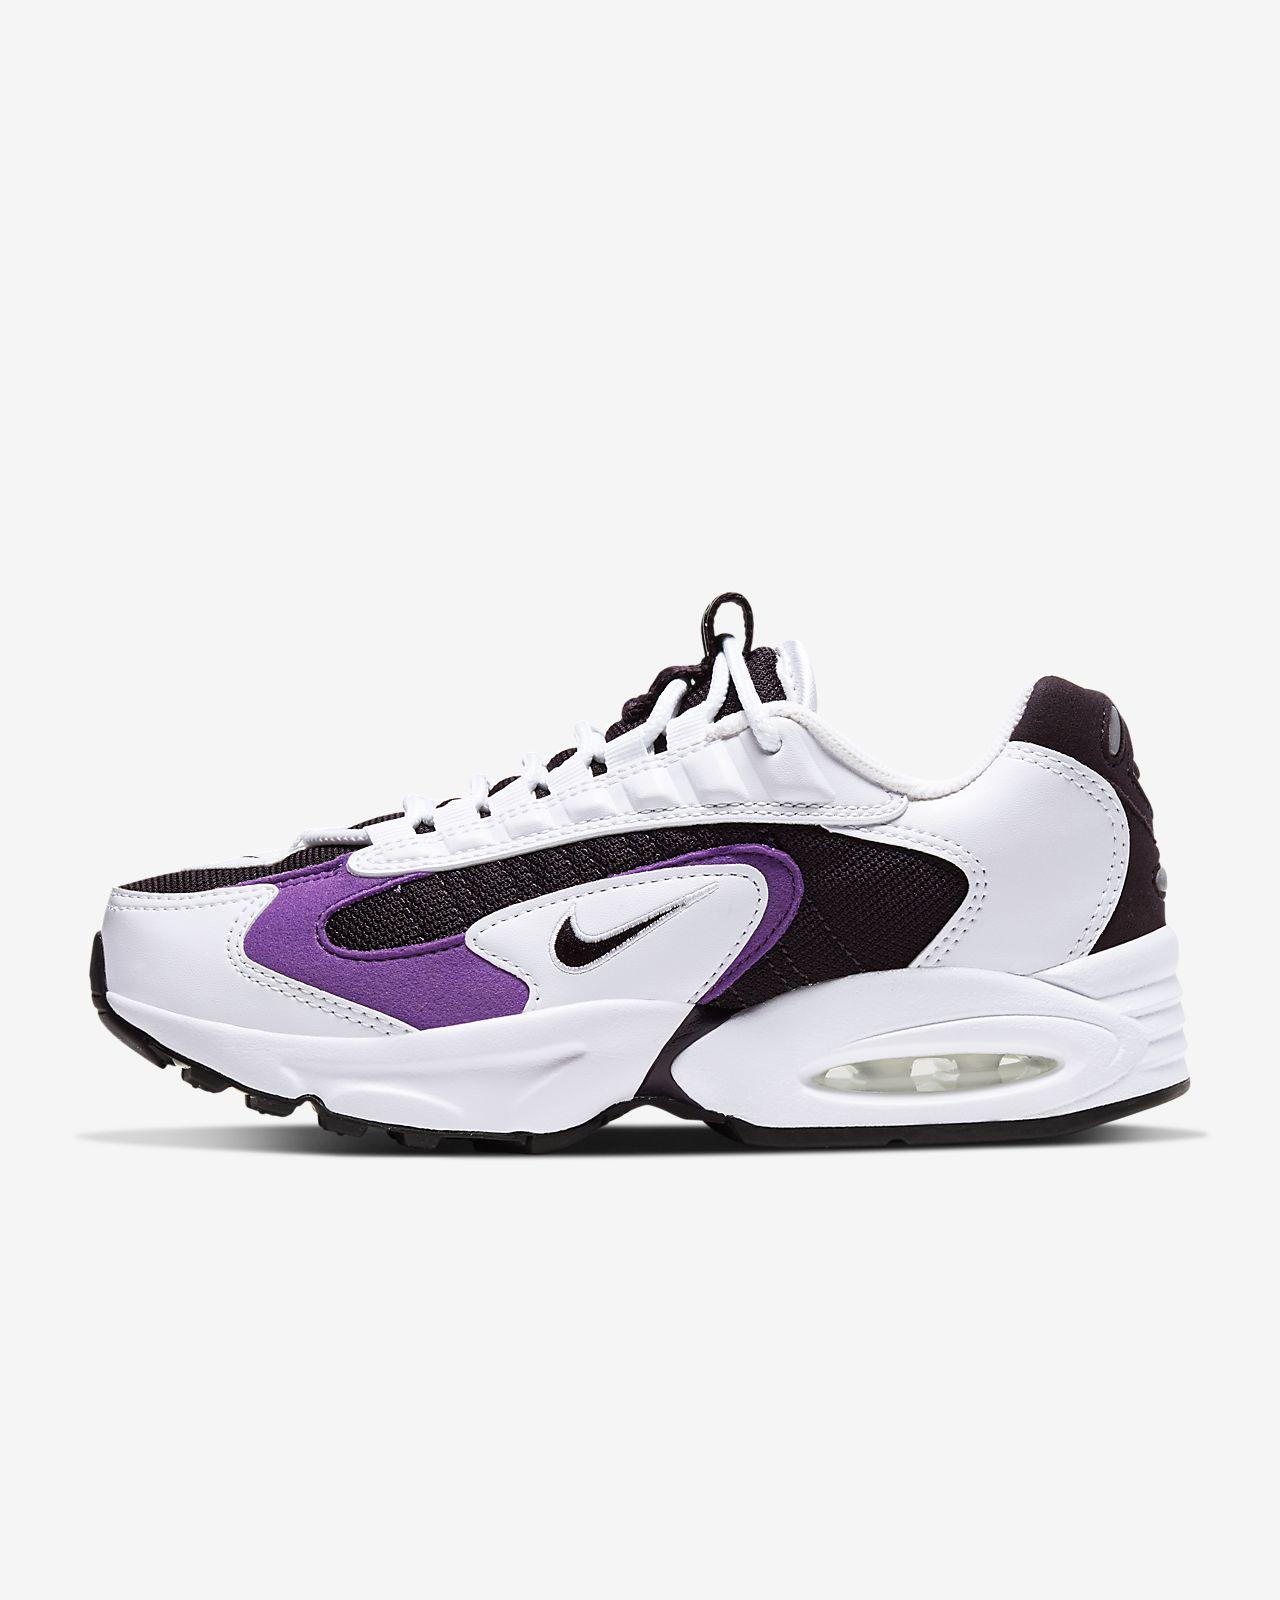 Nike Air Max Triax Kadın Ayakkabısı